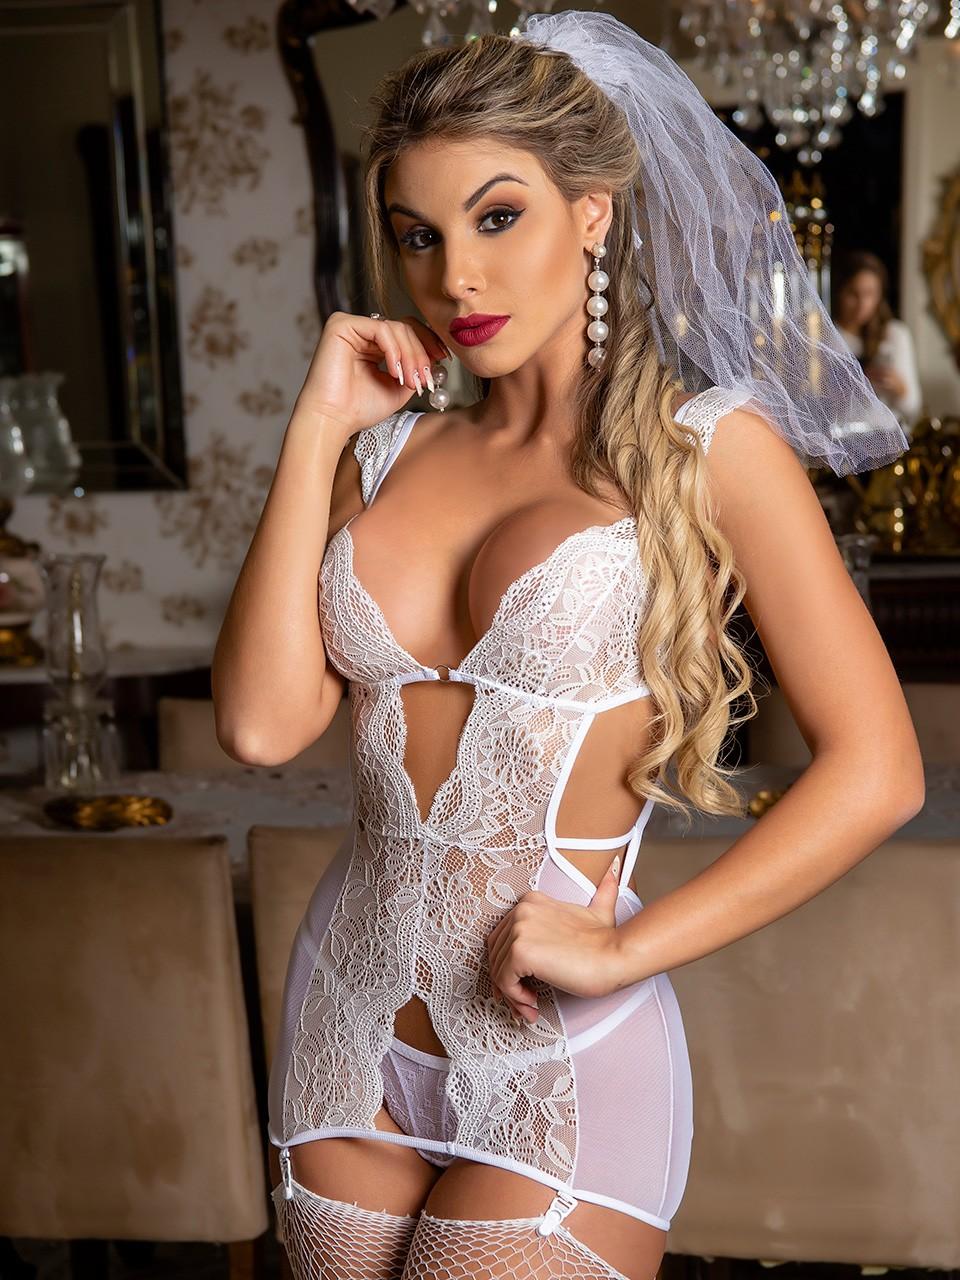 Déguisement fiancée sexy - 2125